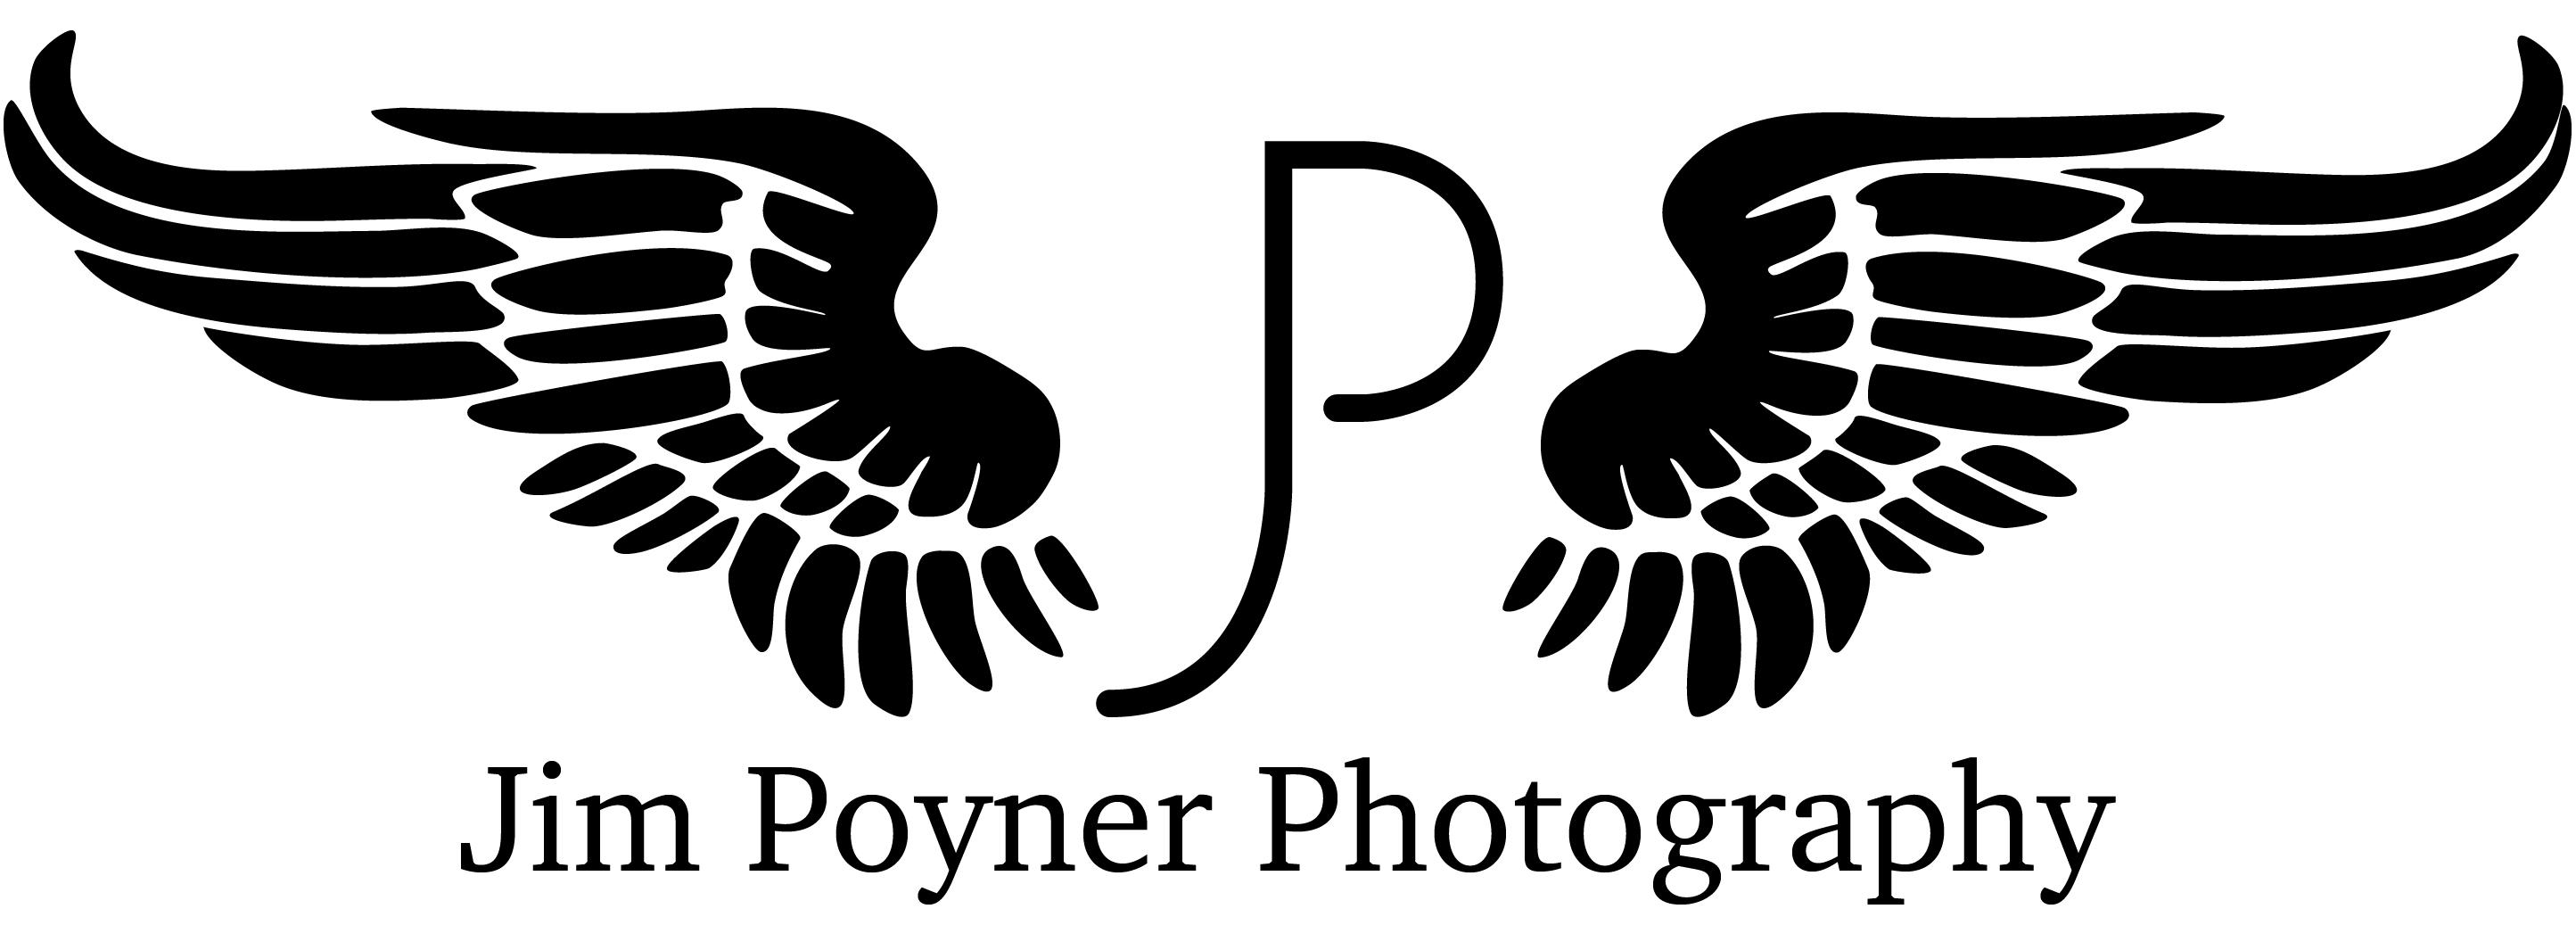 Jim Poyner Photography - Client Site